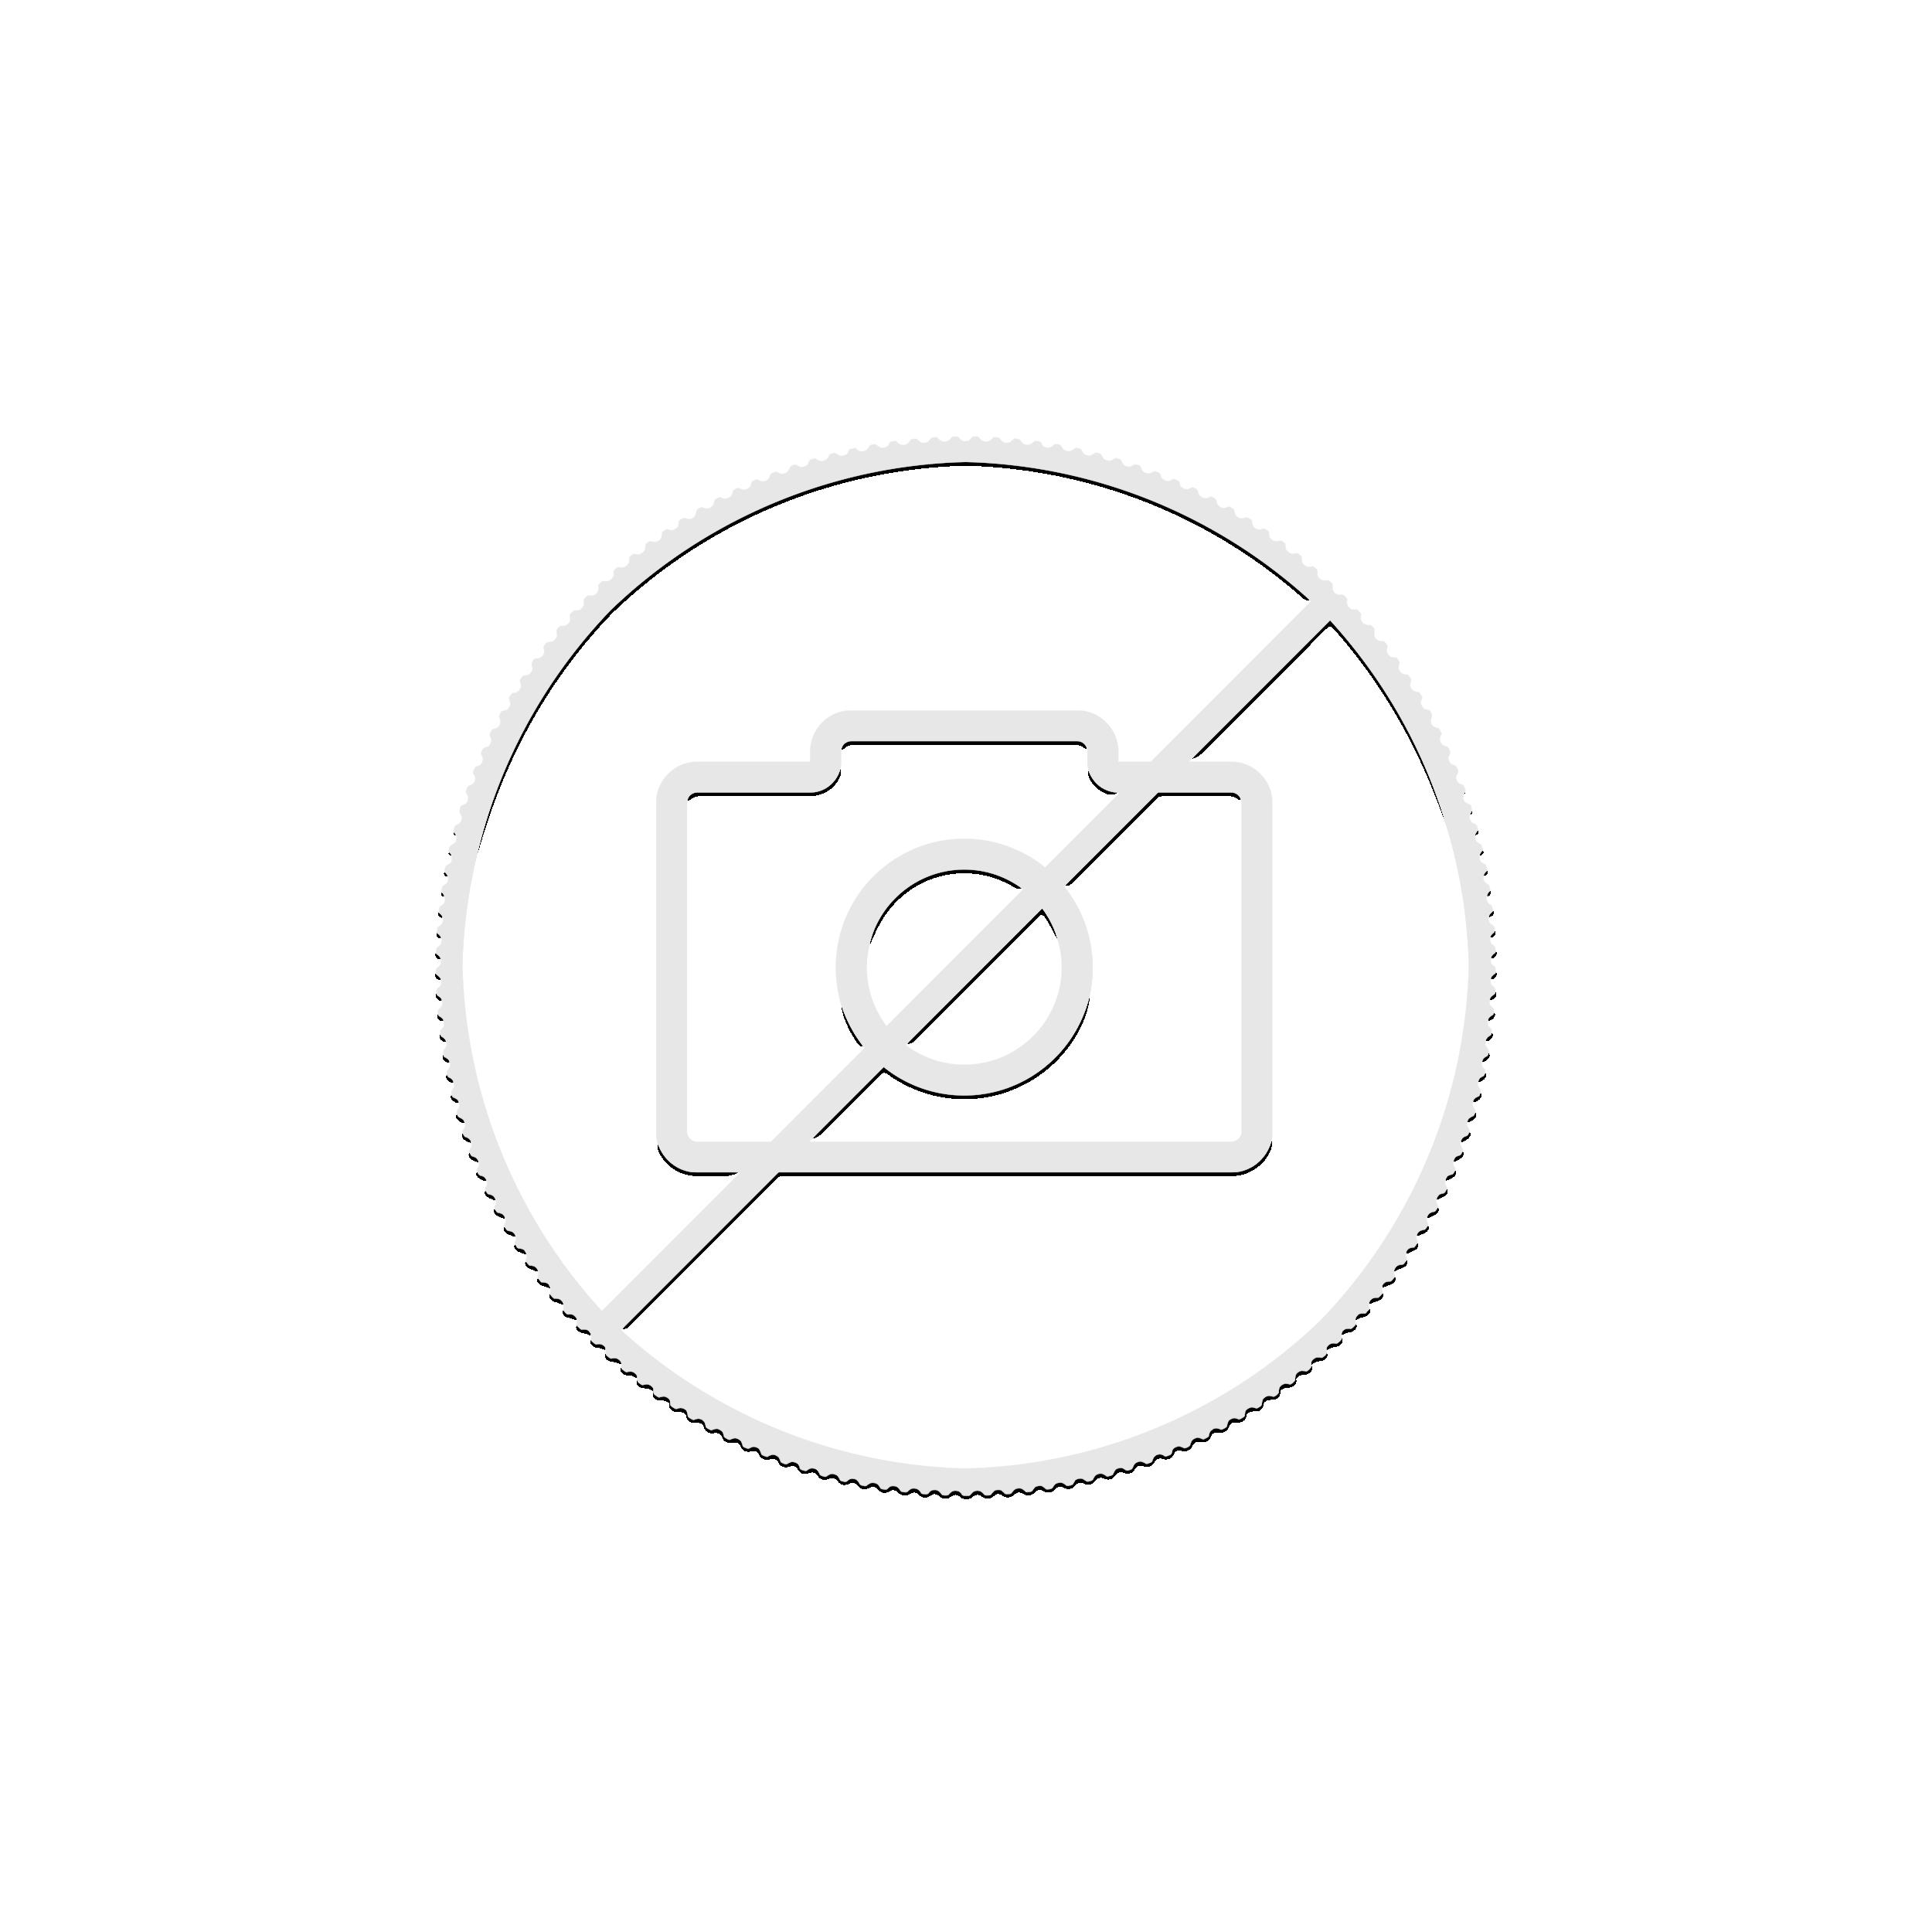 1 Kilo Koala zilver munt 2012